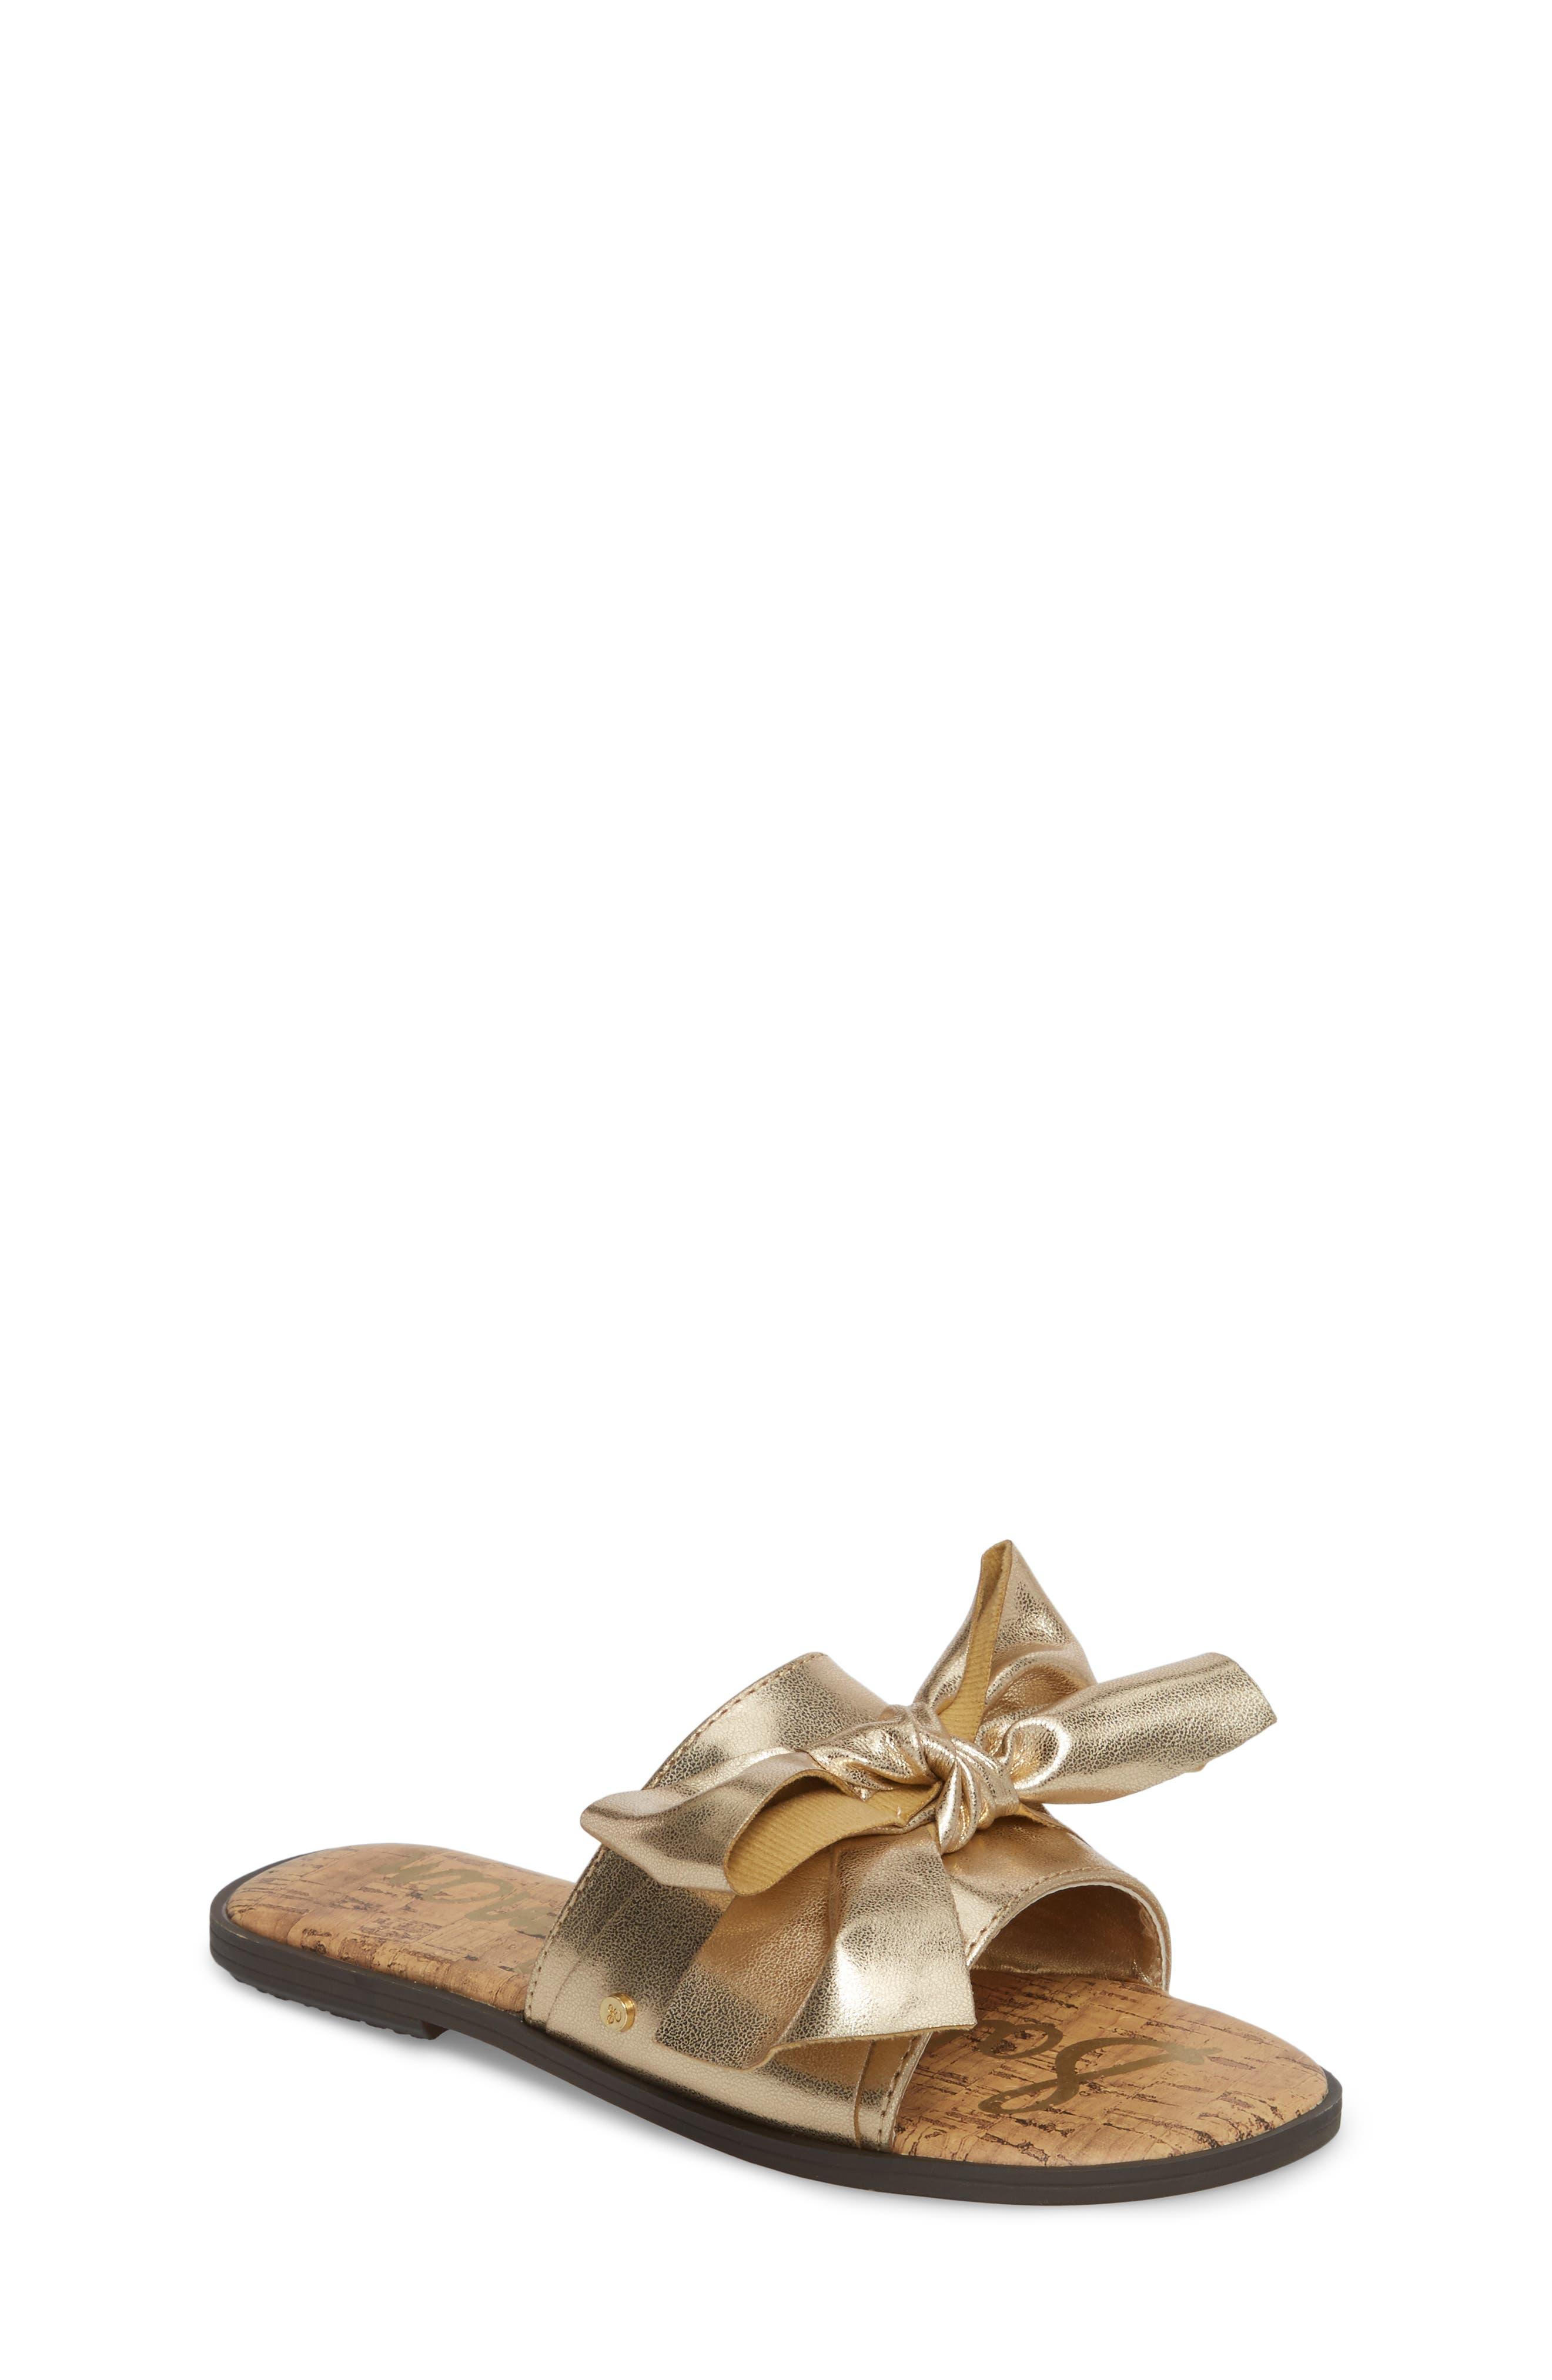 Gigi Bow Faux Leather Sandal,                             Main thumbnail 3, color,